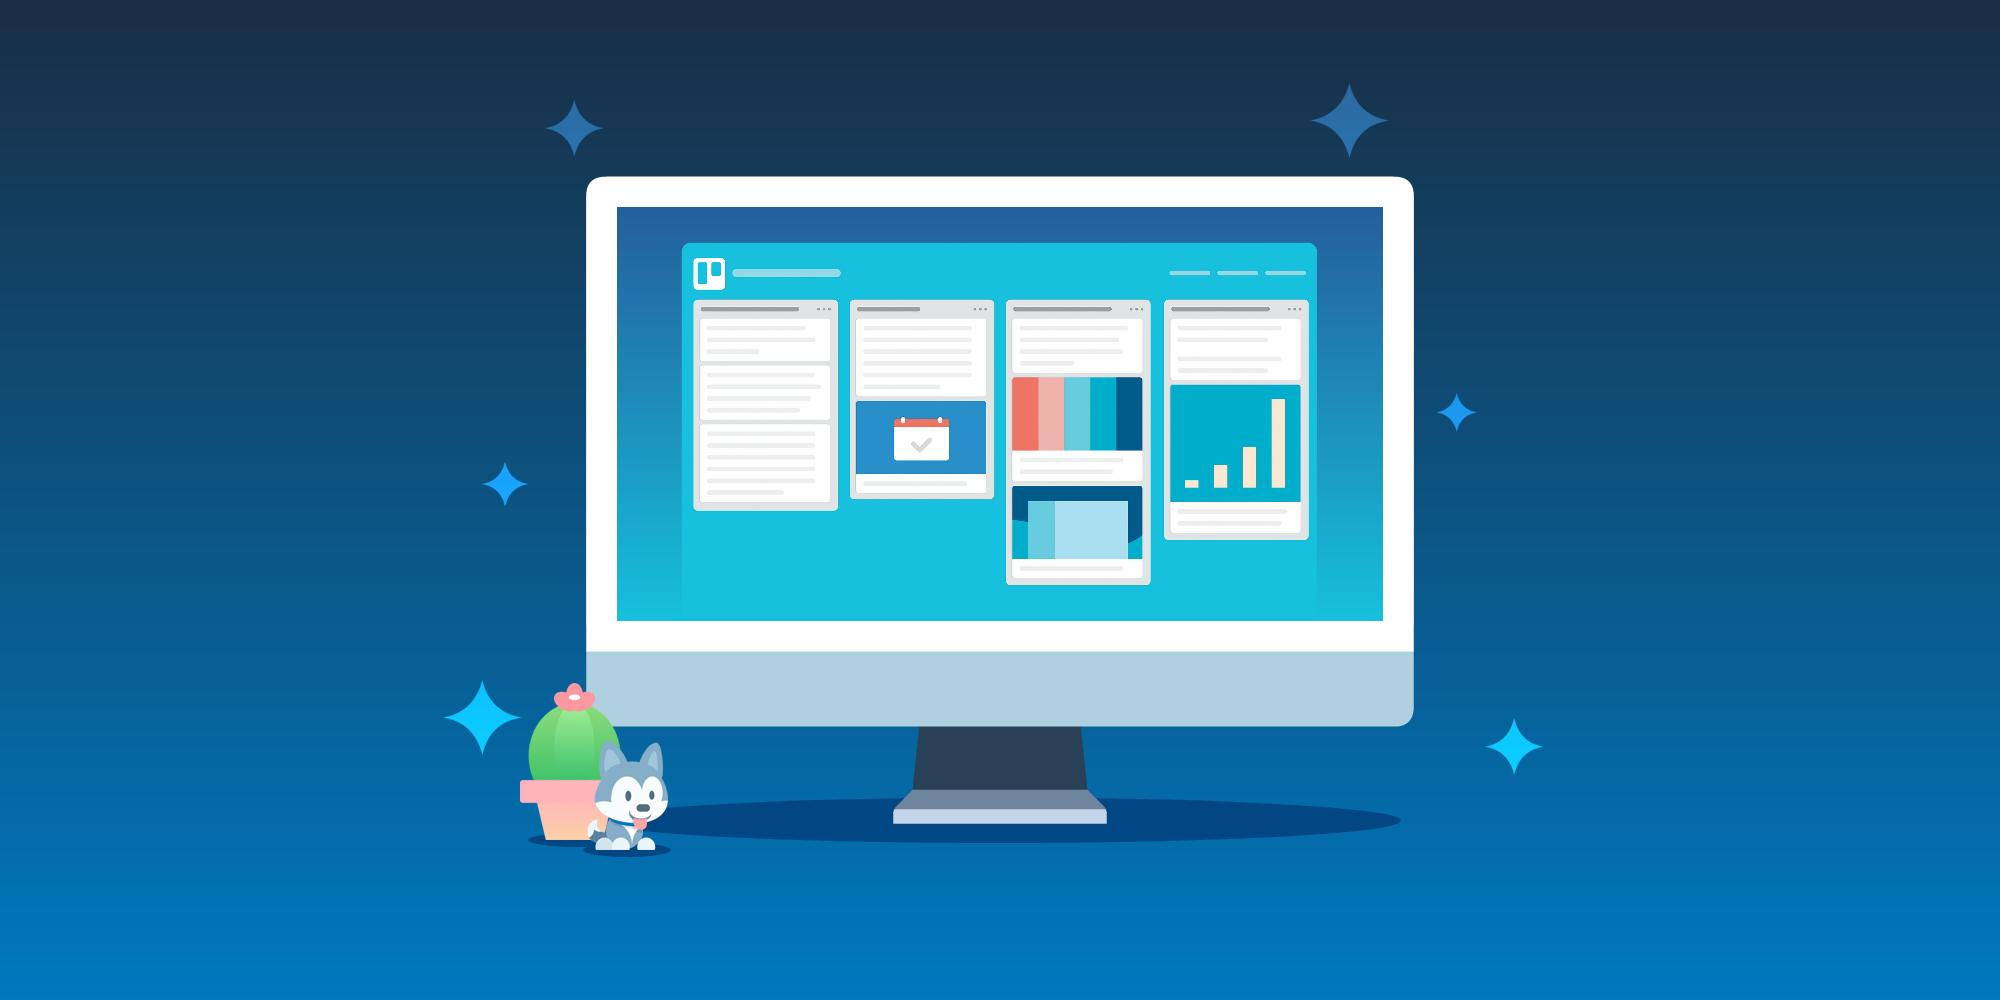 Trello Desktop App for Mac and Windows